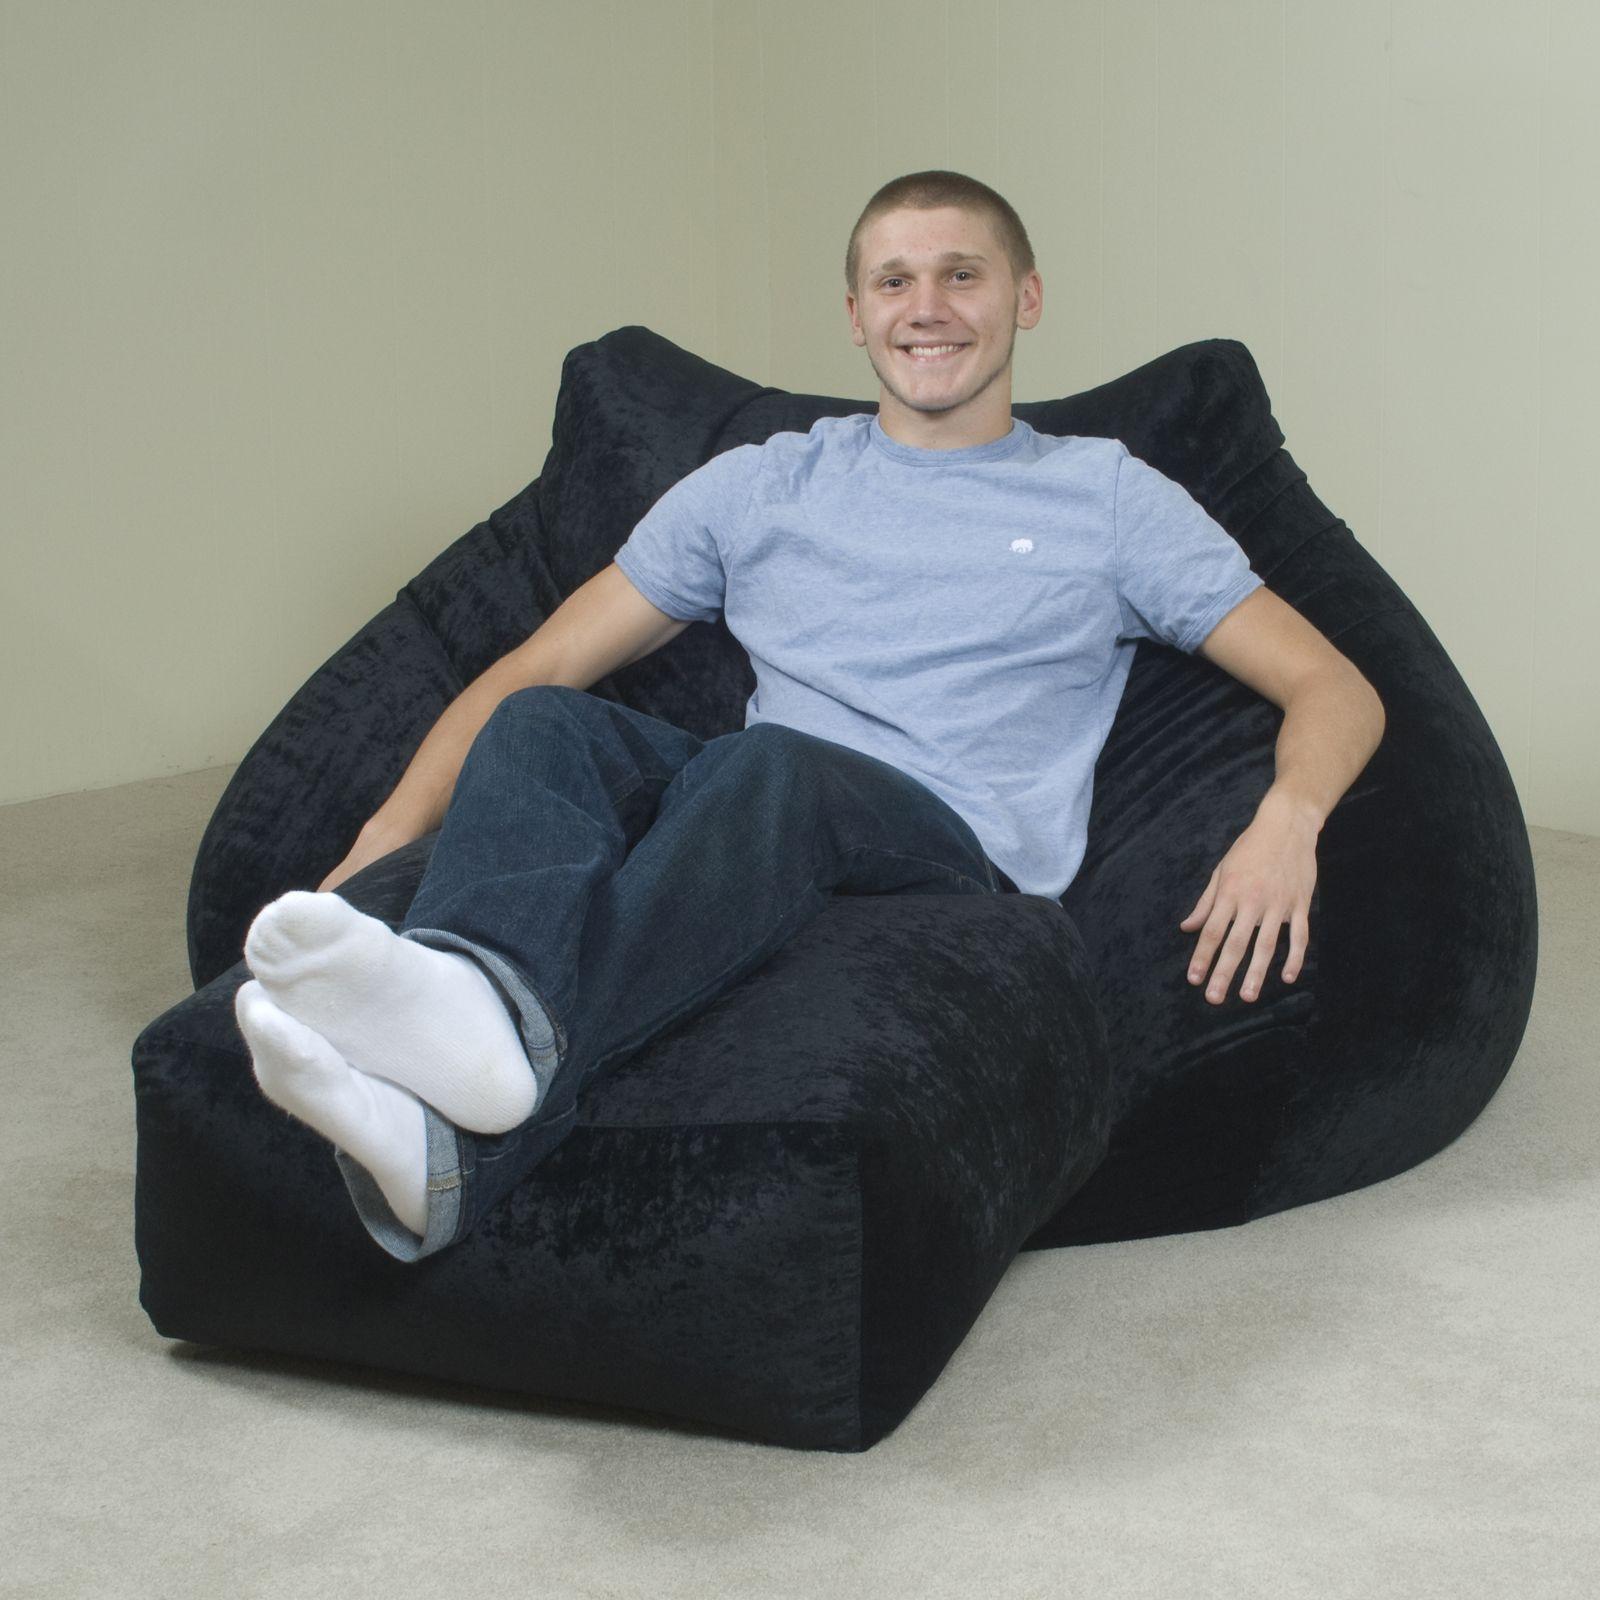 cozybeanbagchairsforadults Adult bean bag chair